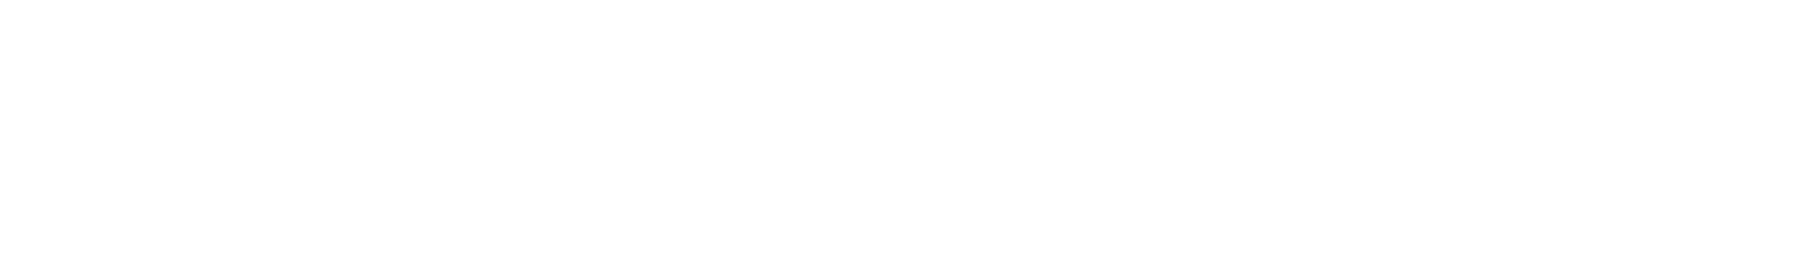 electropacman 125 c pl